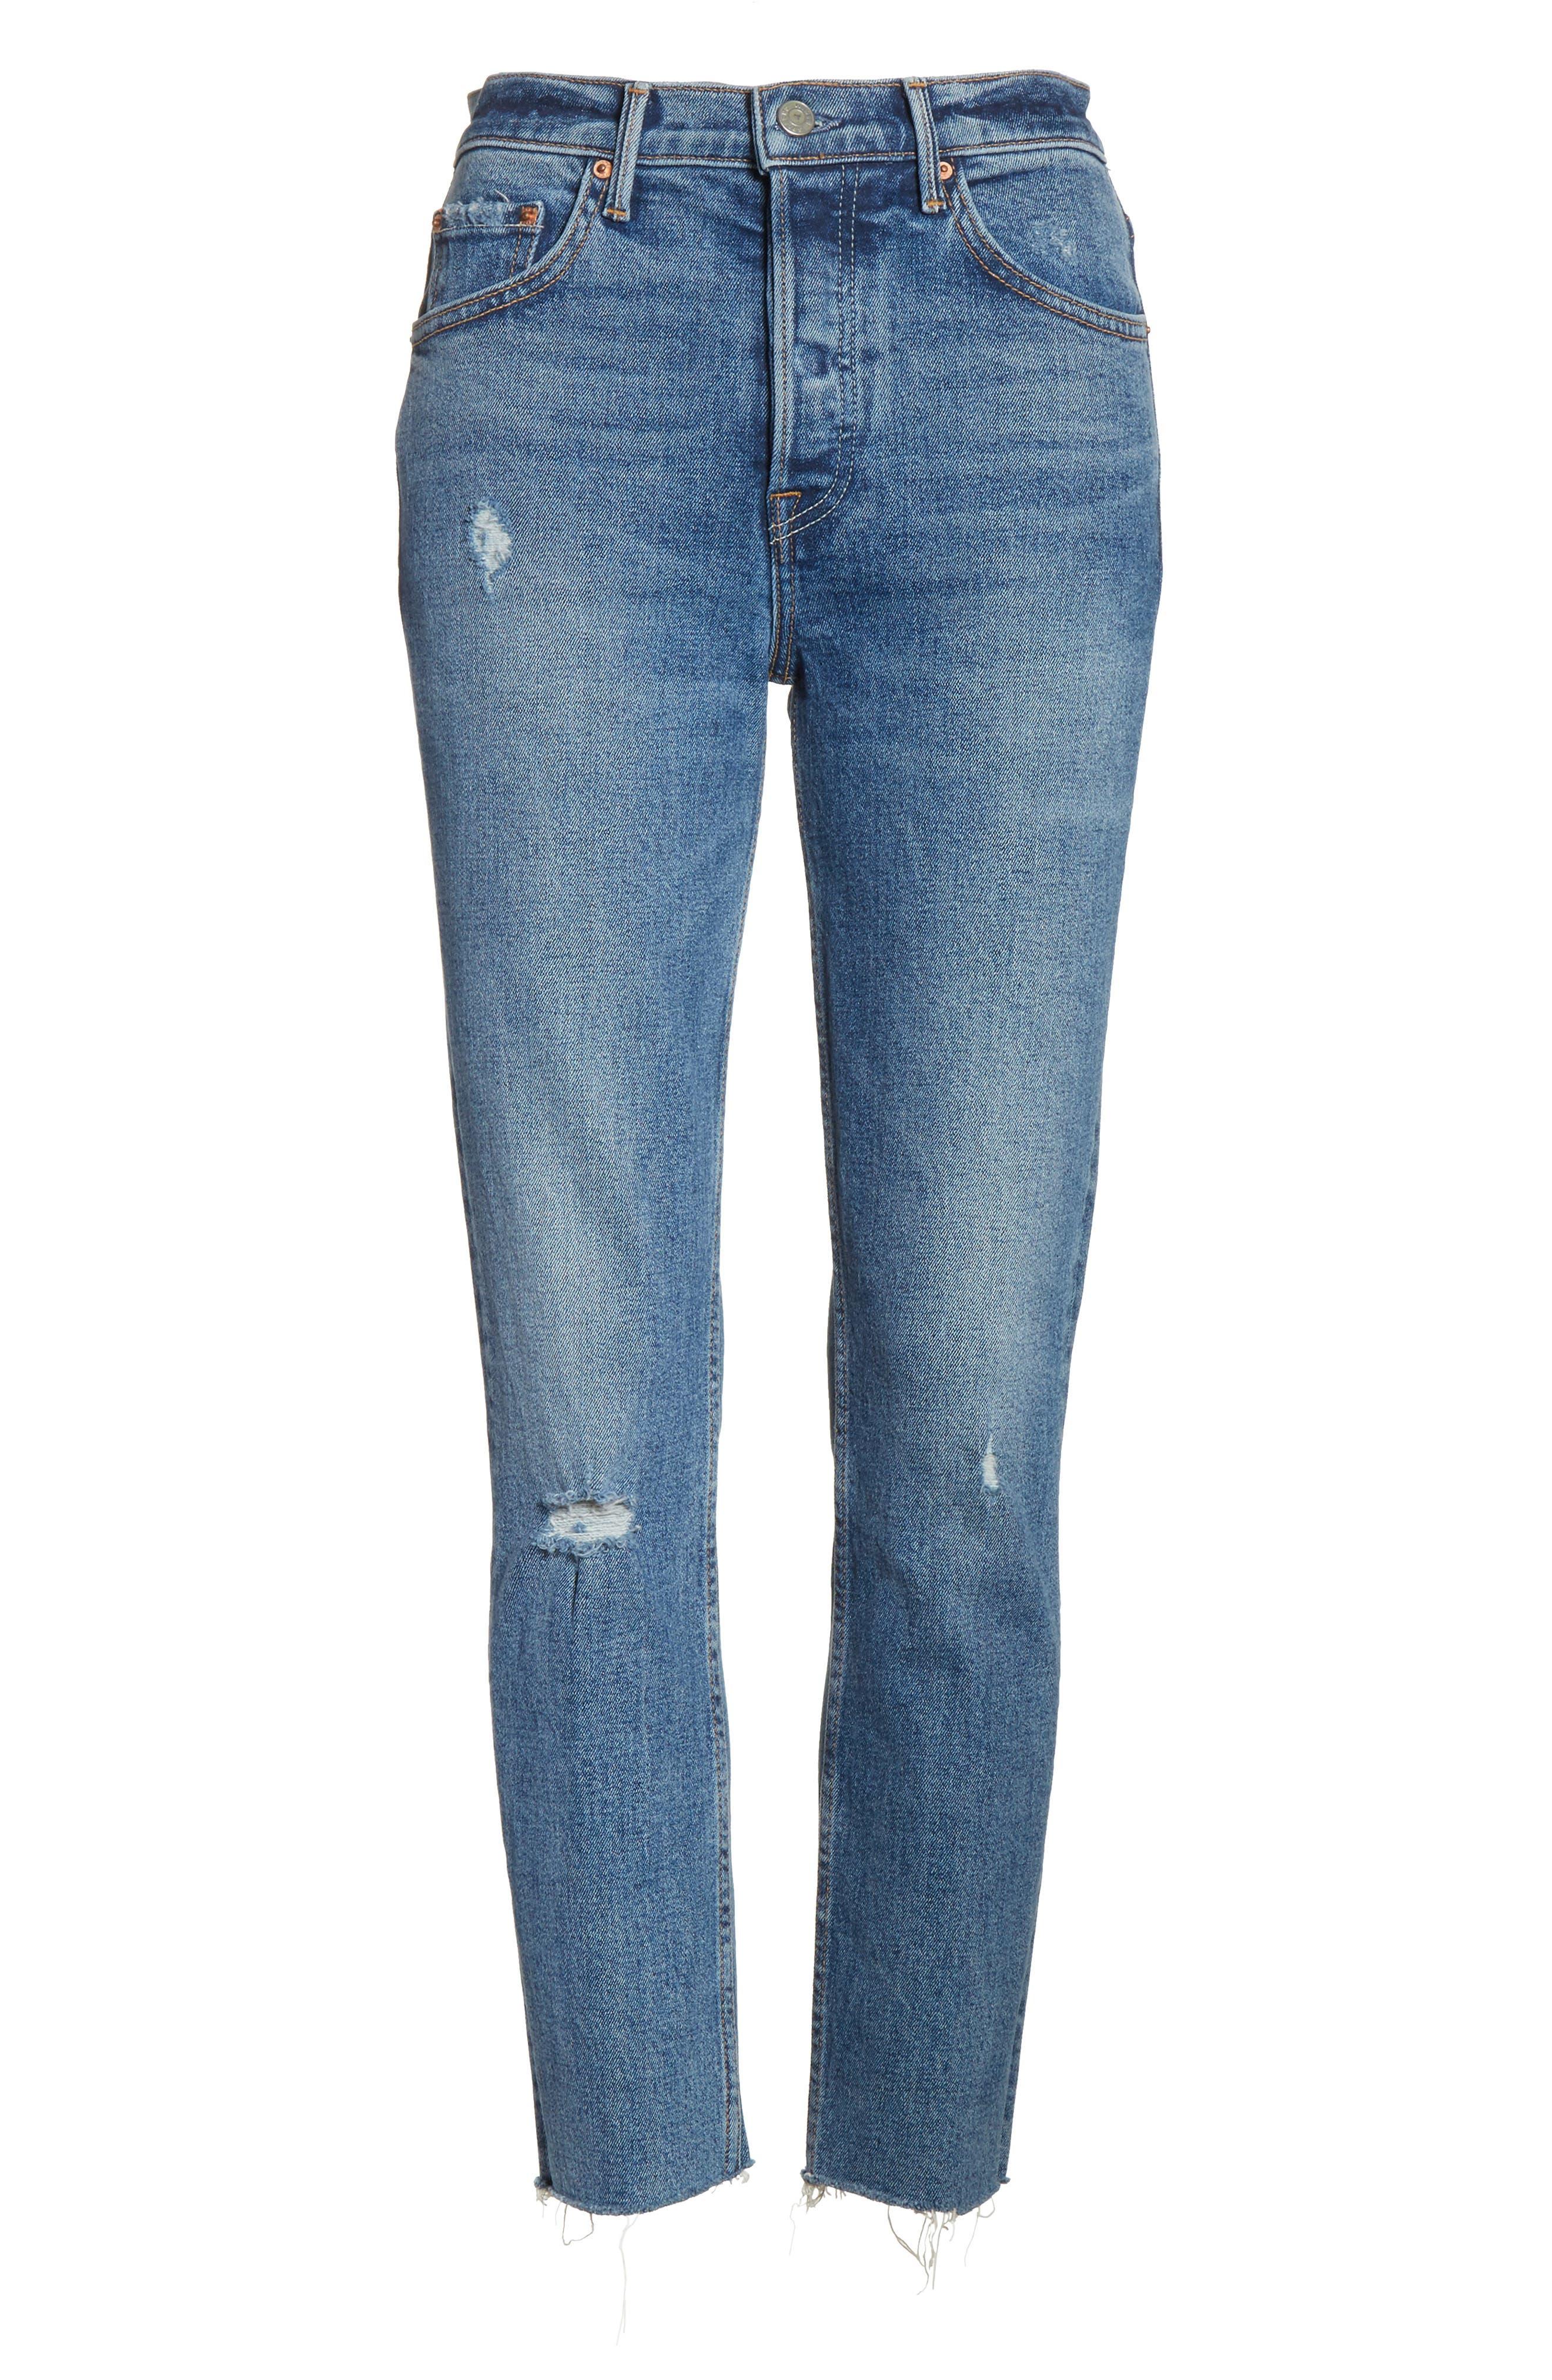 Karolina High Waist Skinny Jeans,                             Alternate thumbnail 6, color,                             SIXPENCE